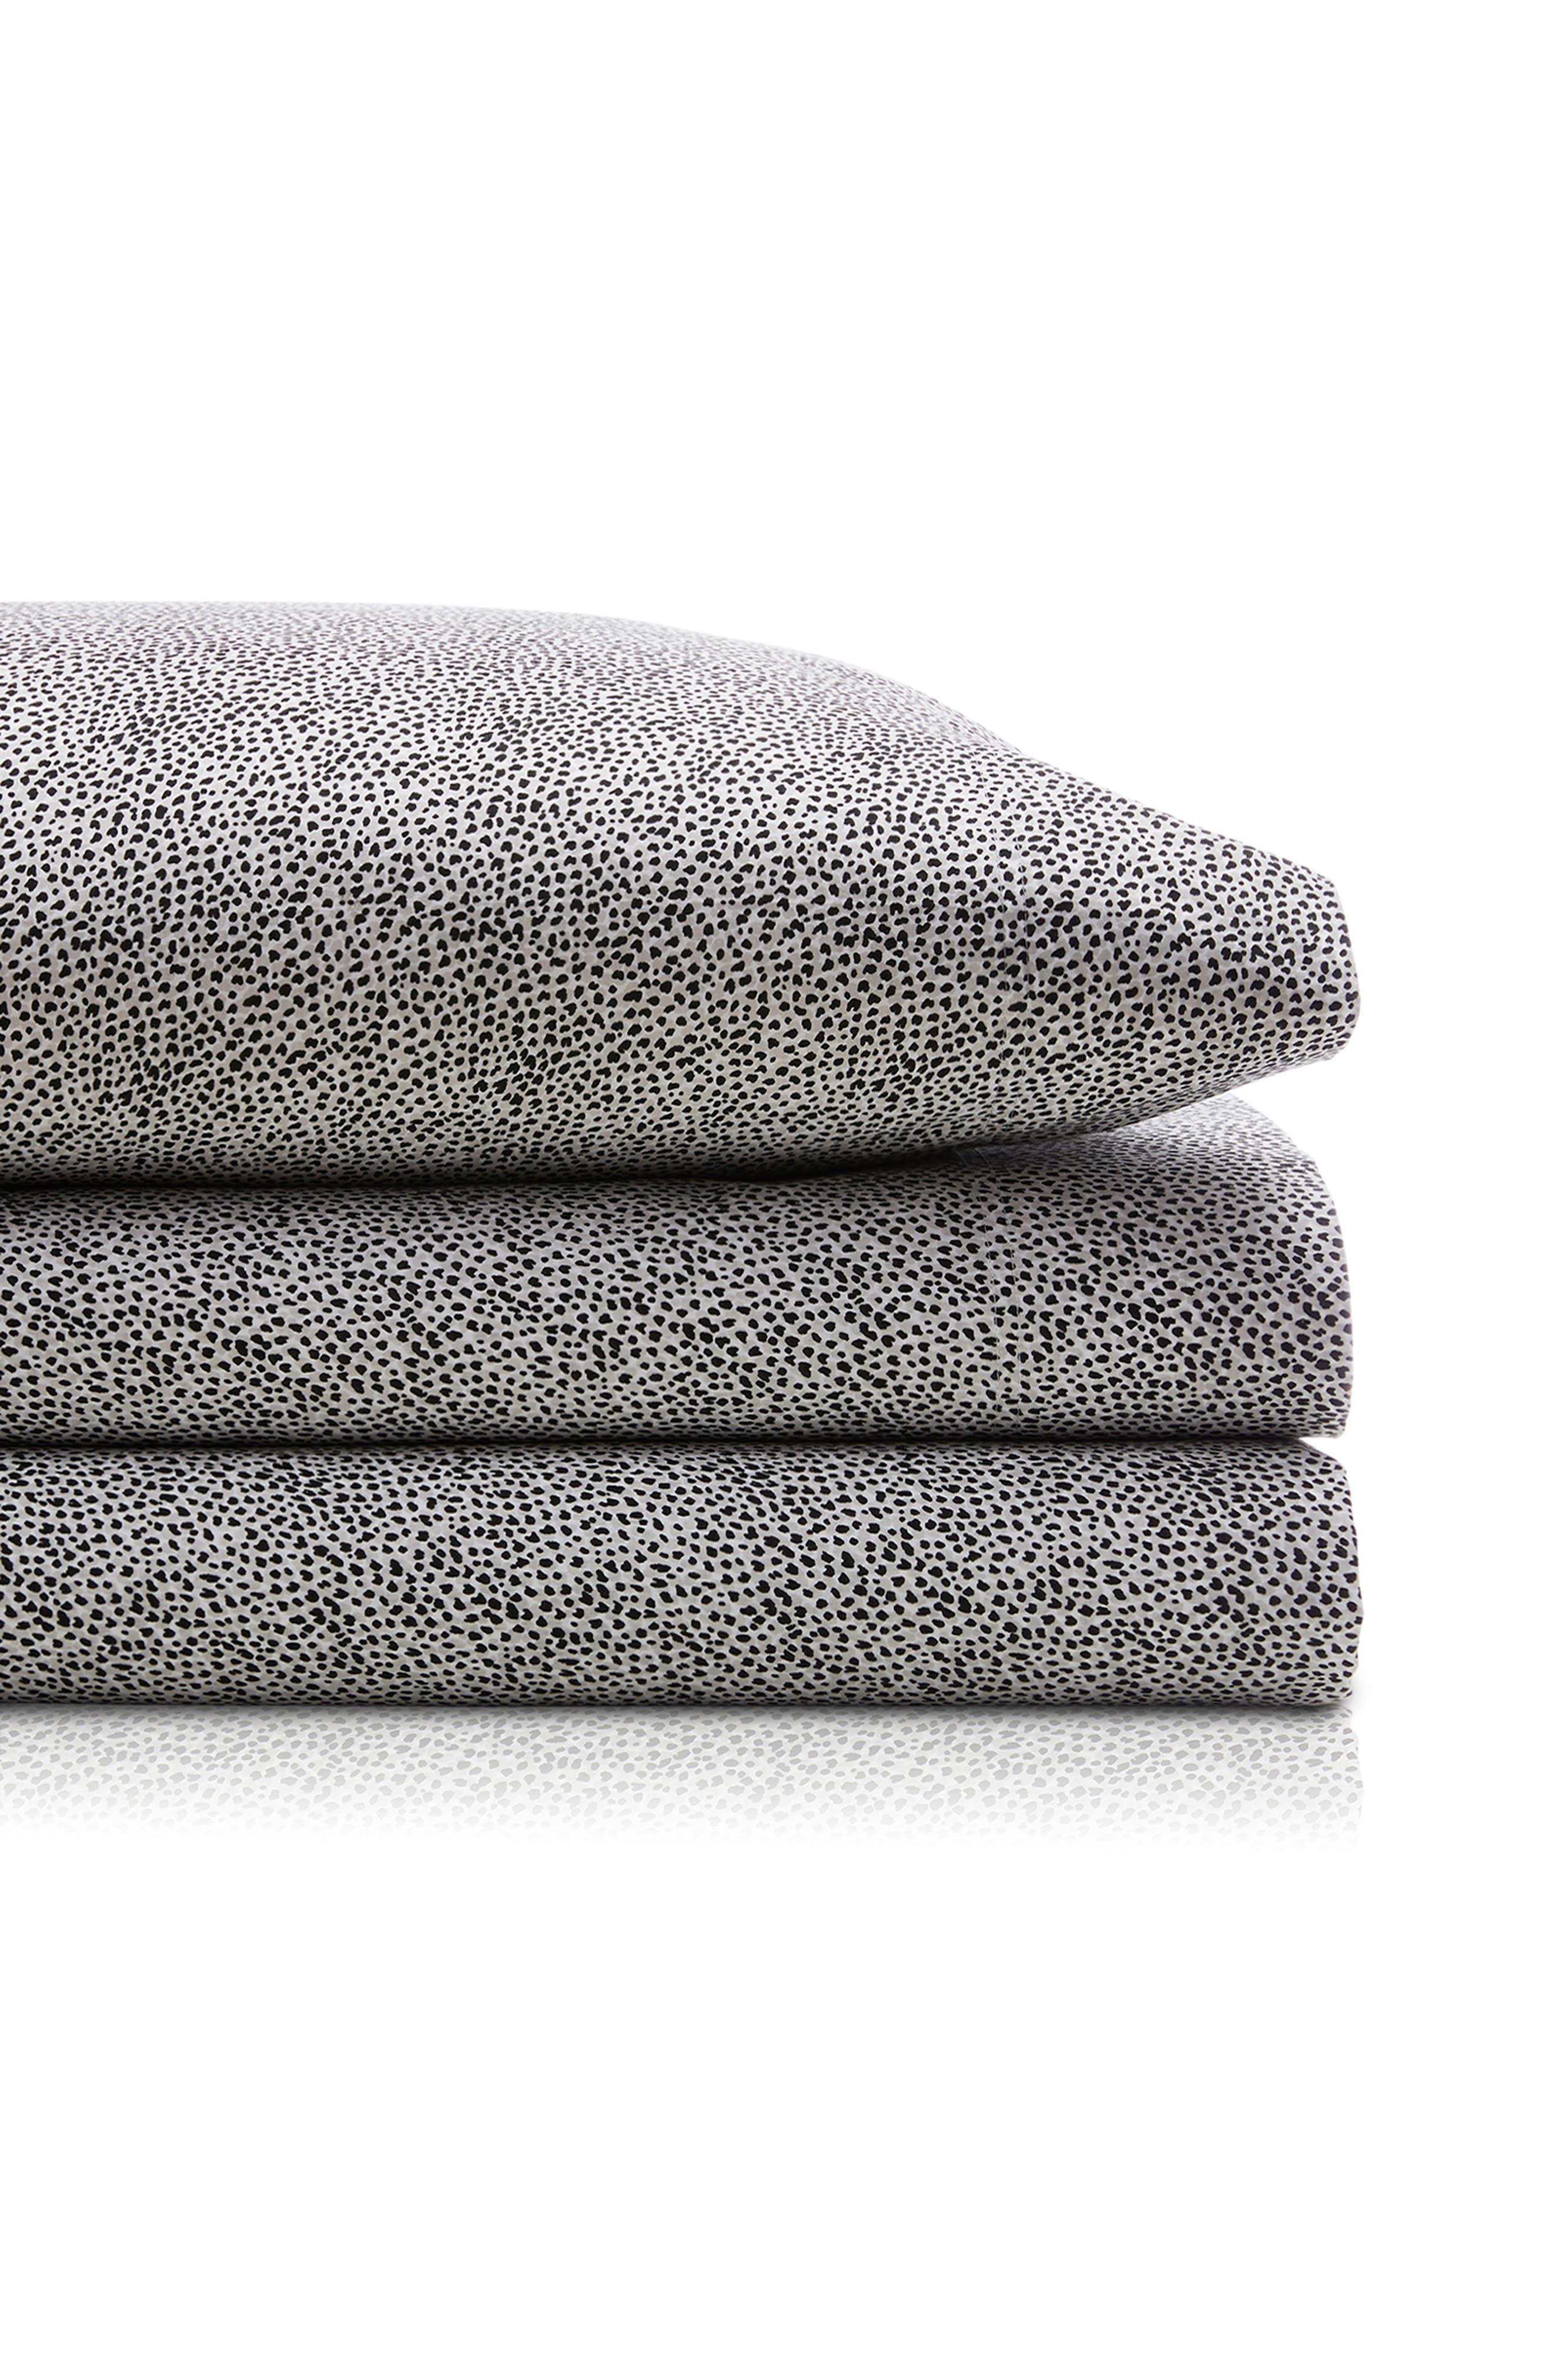 BCBGeneration Leopard Spots Set of 2 Pillowcases